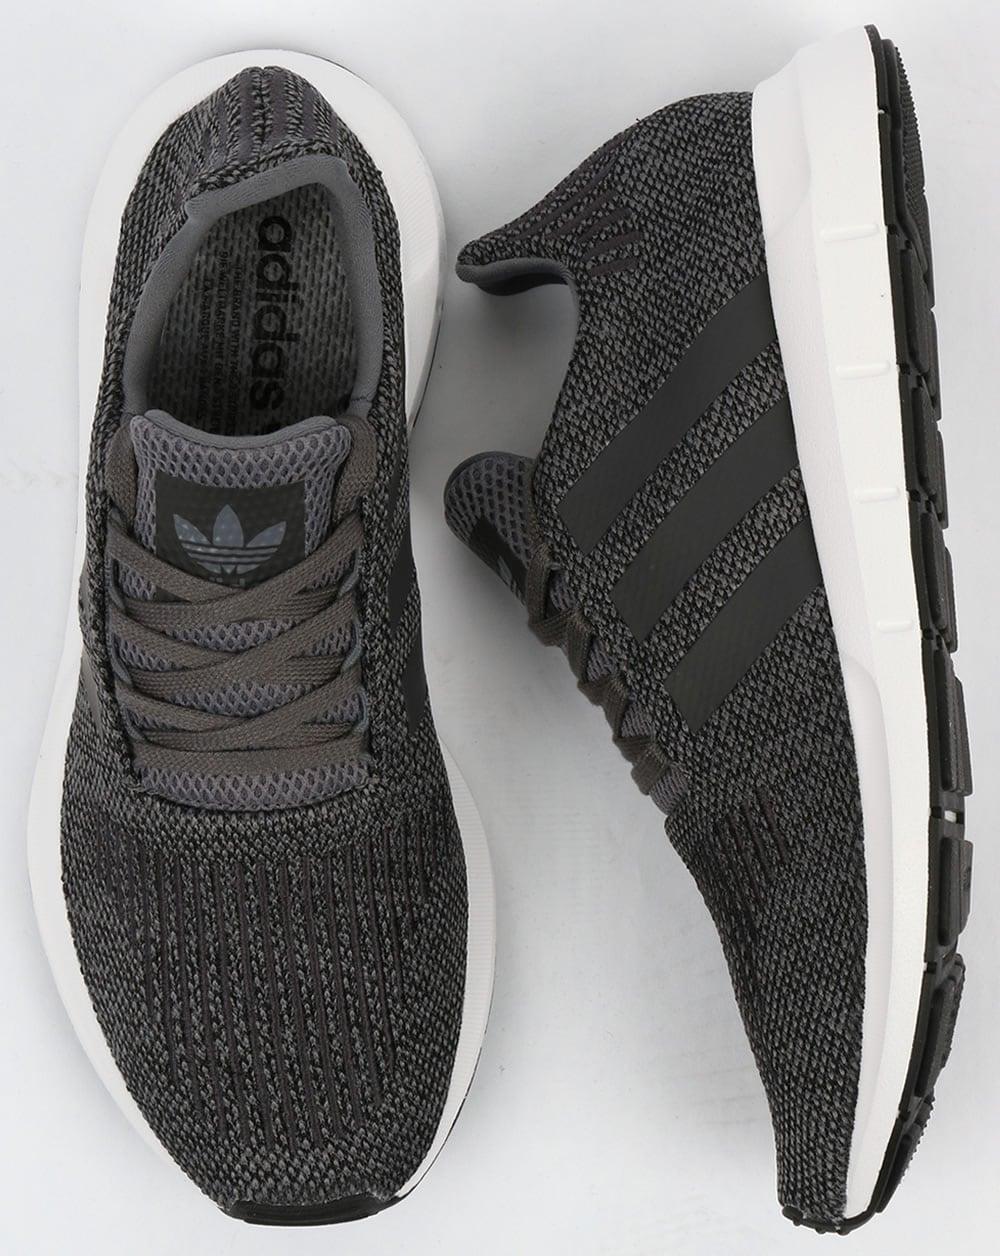 Adidas Swift Run Trainers Grey/Black,shoes,running,prime